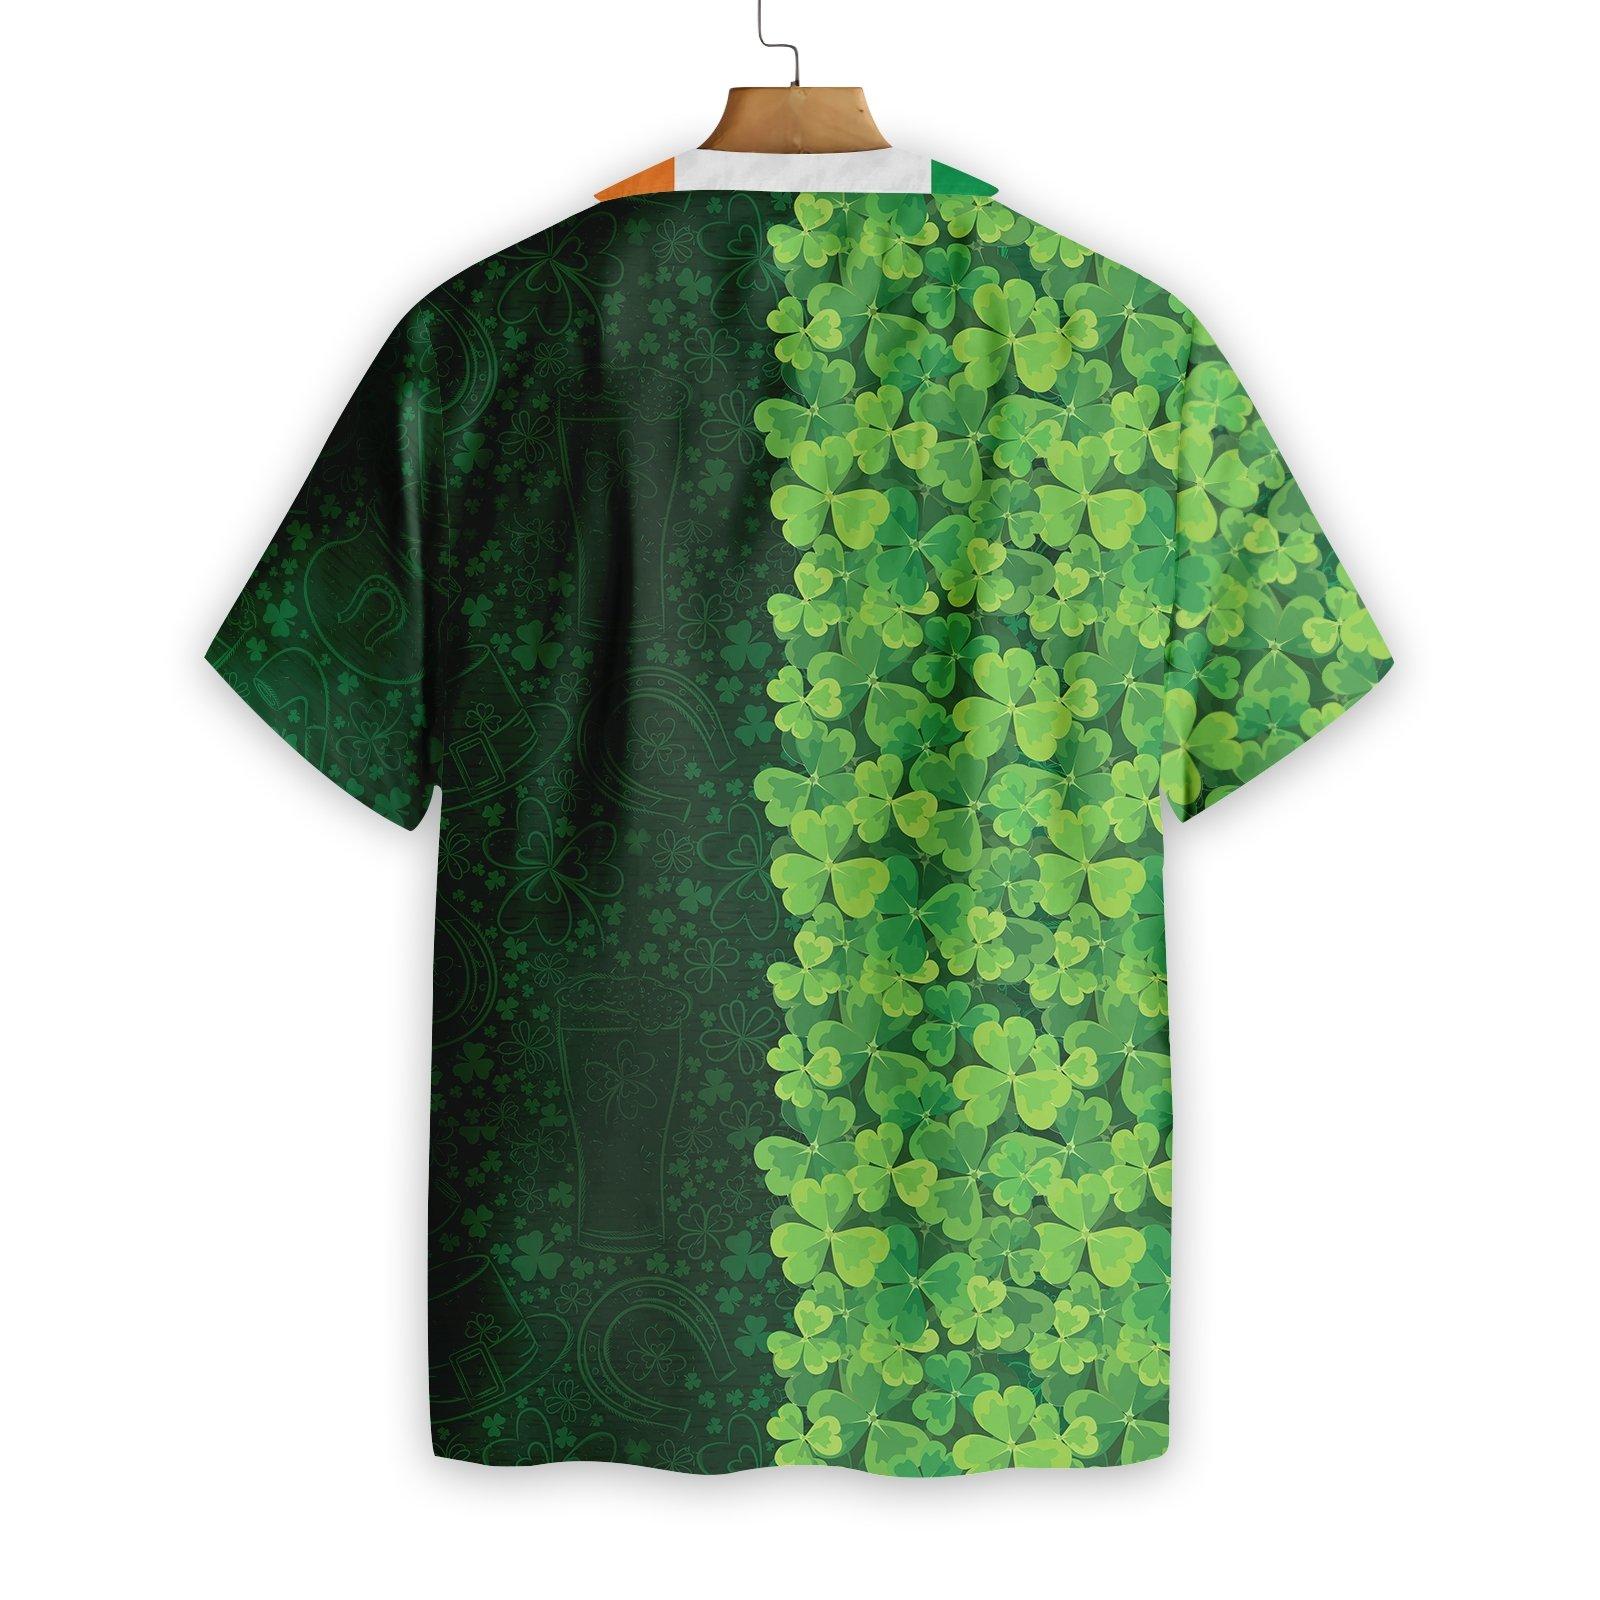 Personalized Shamrock Happy Saint Patrick's Day Irish Ireland Hawaiian Shirt 2